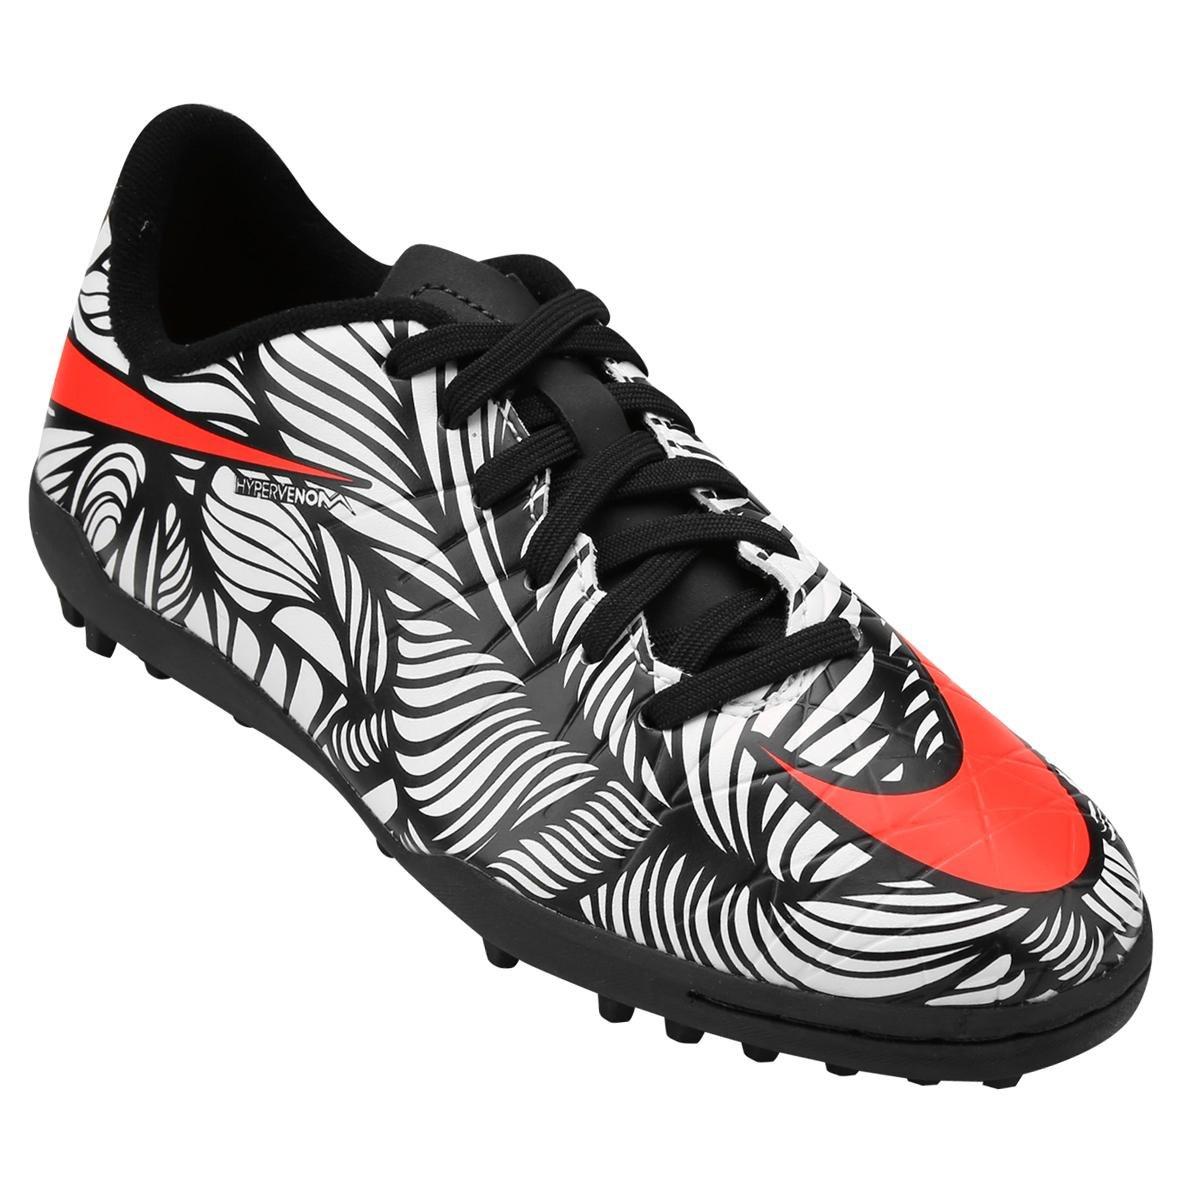 0a4b8f87b84d2 Chuteira Nike Hypervenom Phelon 2 NJR TF Society Infantil | Shop Timão